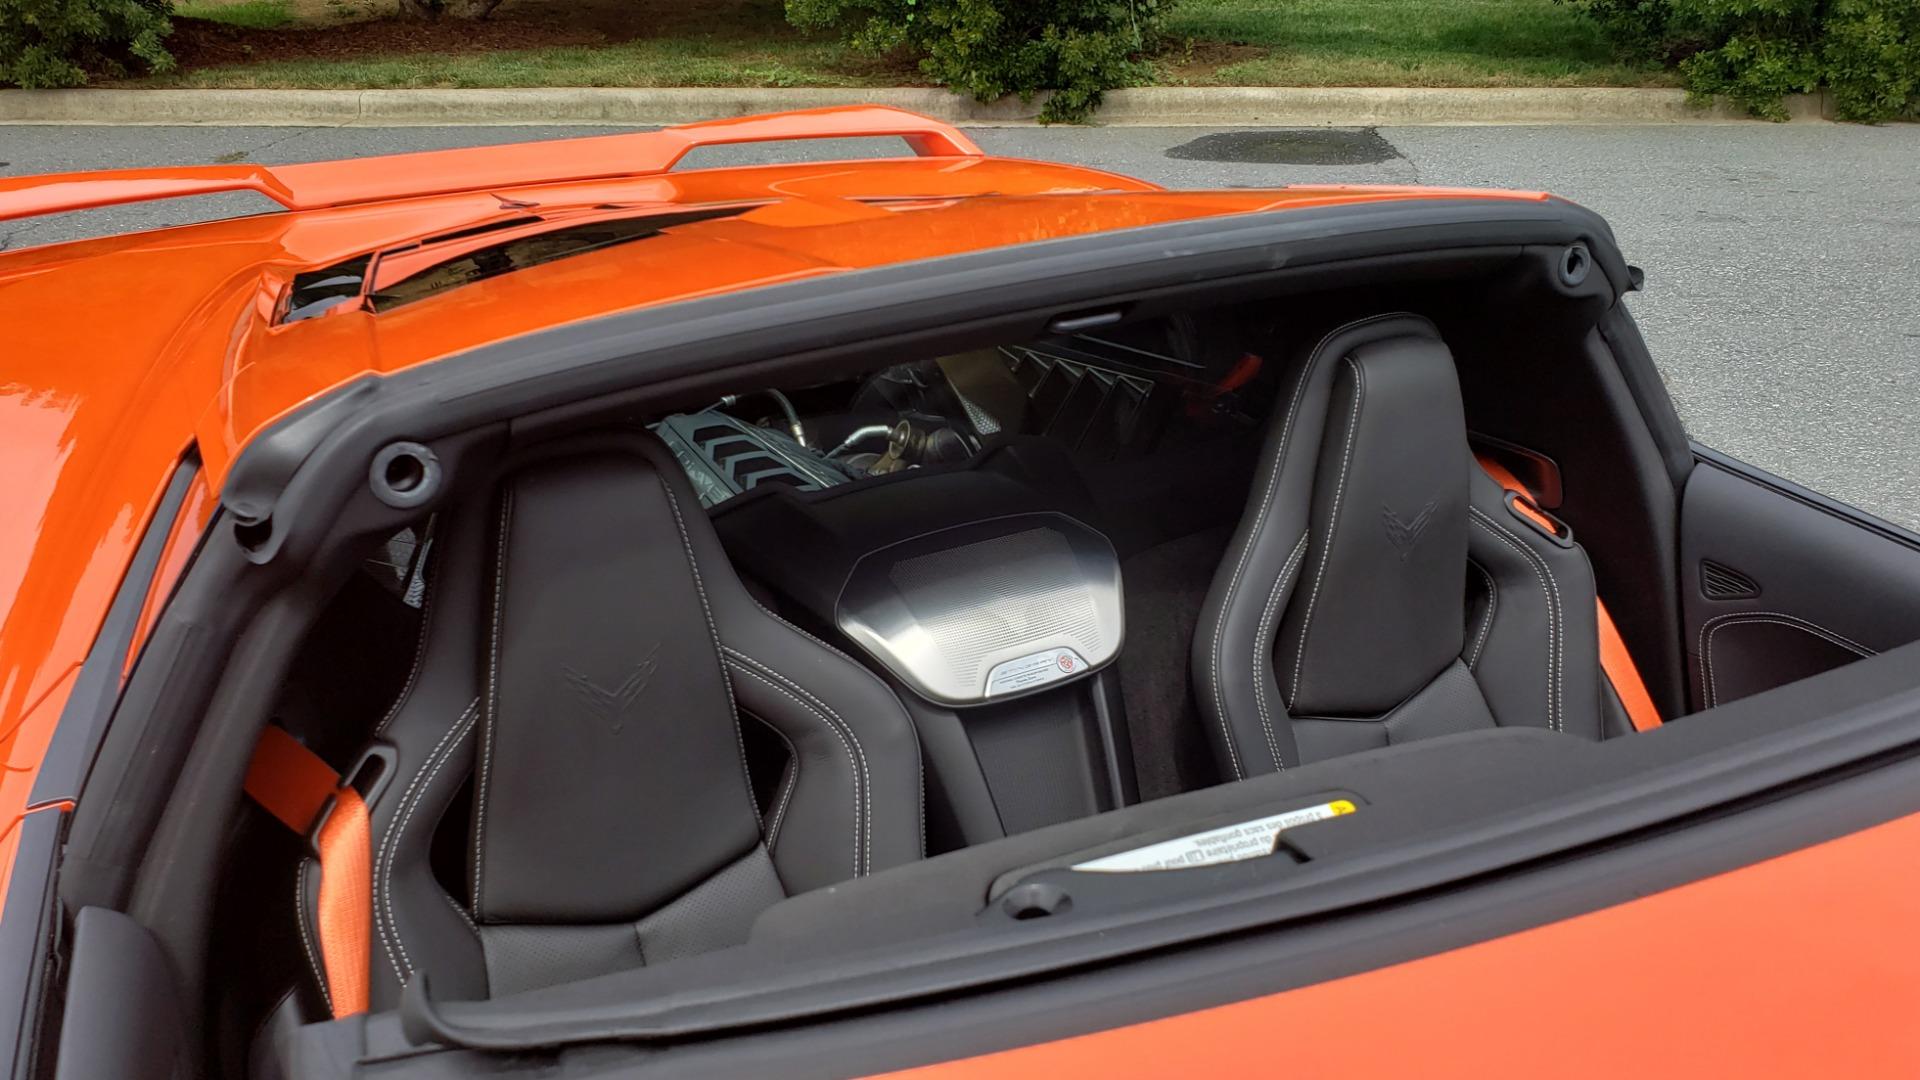 Used 2020 Chevrolet CORVETTE C8 STINGRAY 2LT / 6.2L V8 / 8-SPD AUTO / NAV / BOSE / REARVIEW / DATA RECOR for sale Sold at Formula Imports in Charlotte NC 28227 81